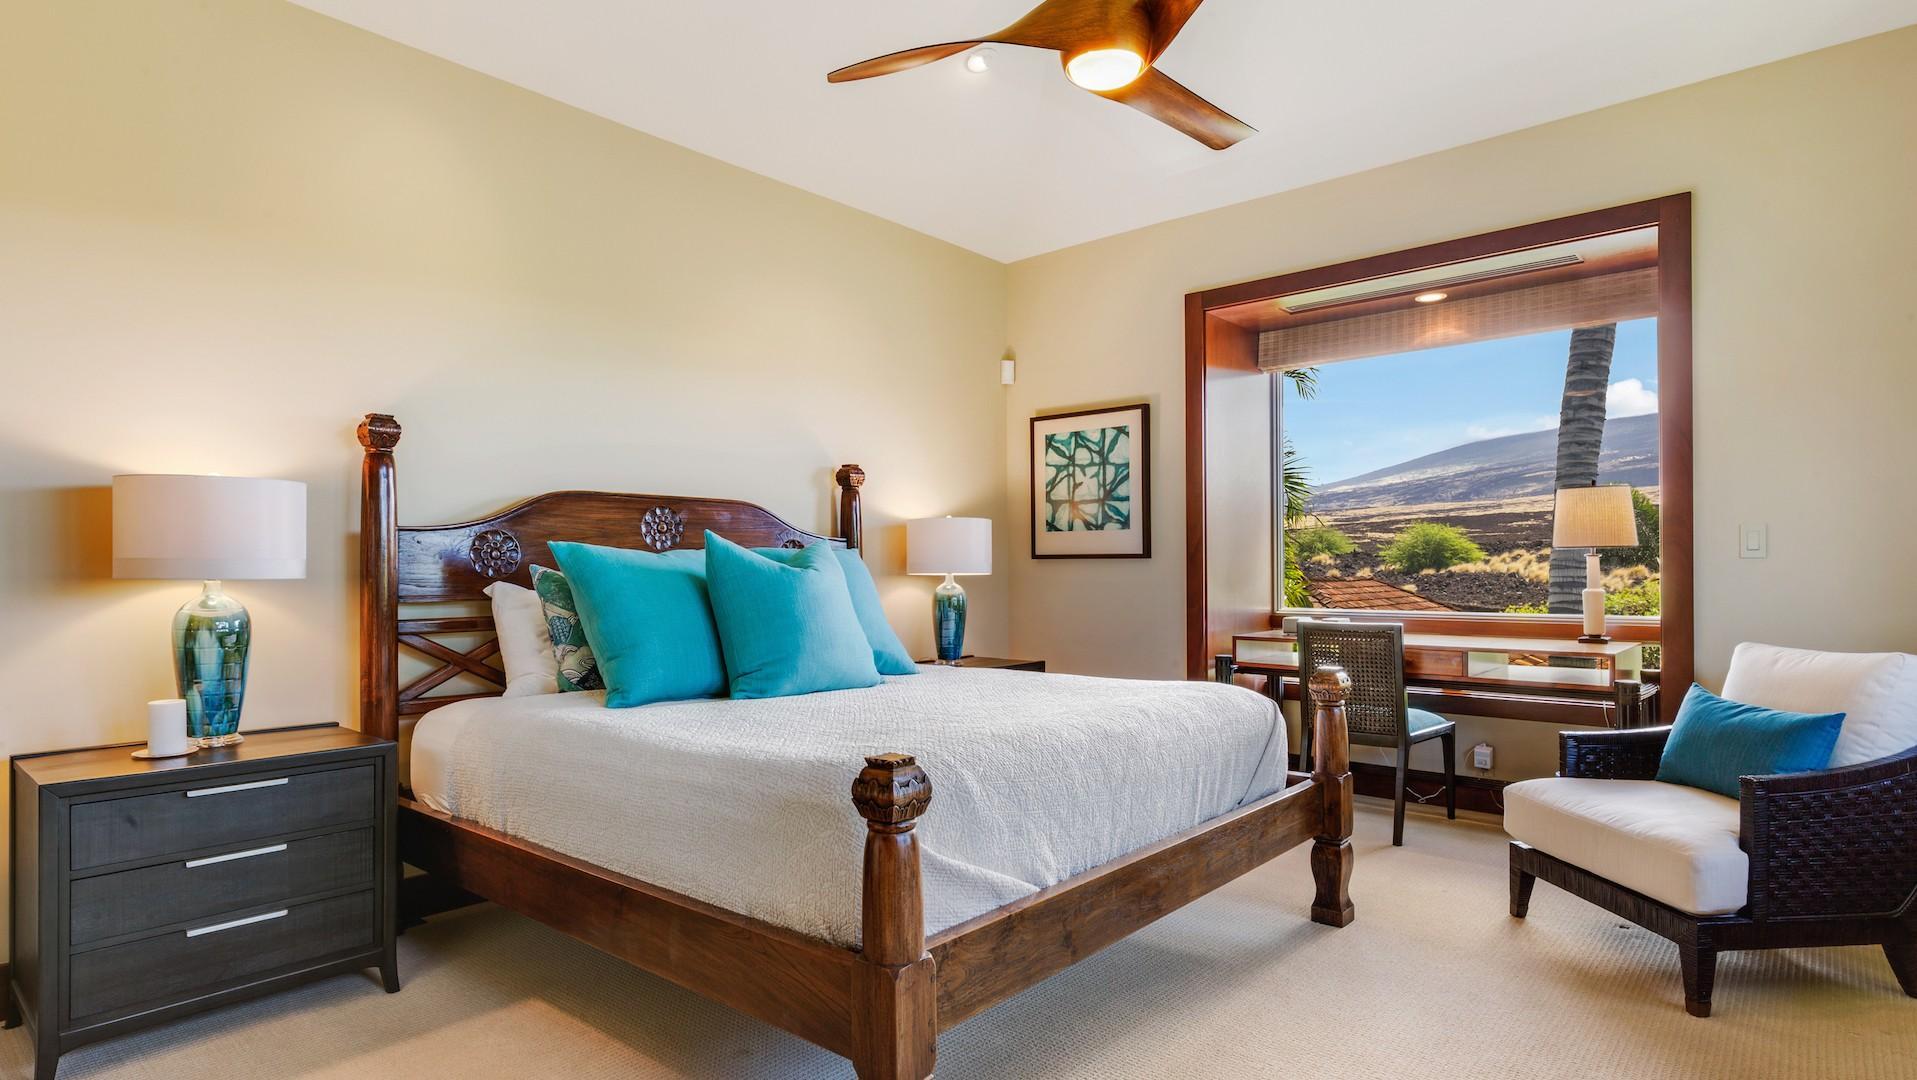 Third bedroom, with en suite bathroom and views of Mount Hualalai.